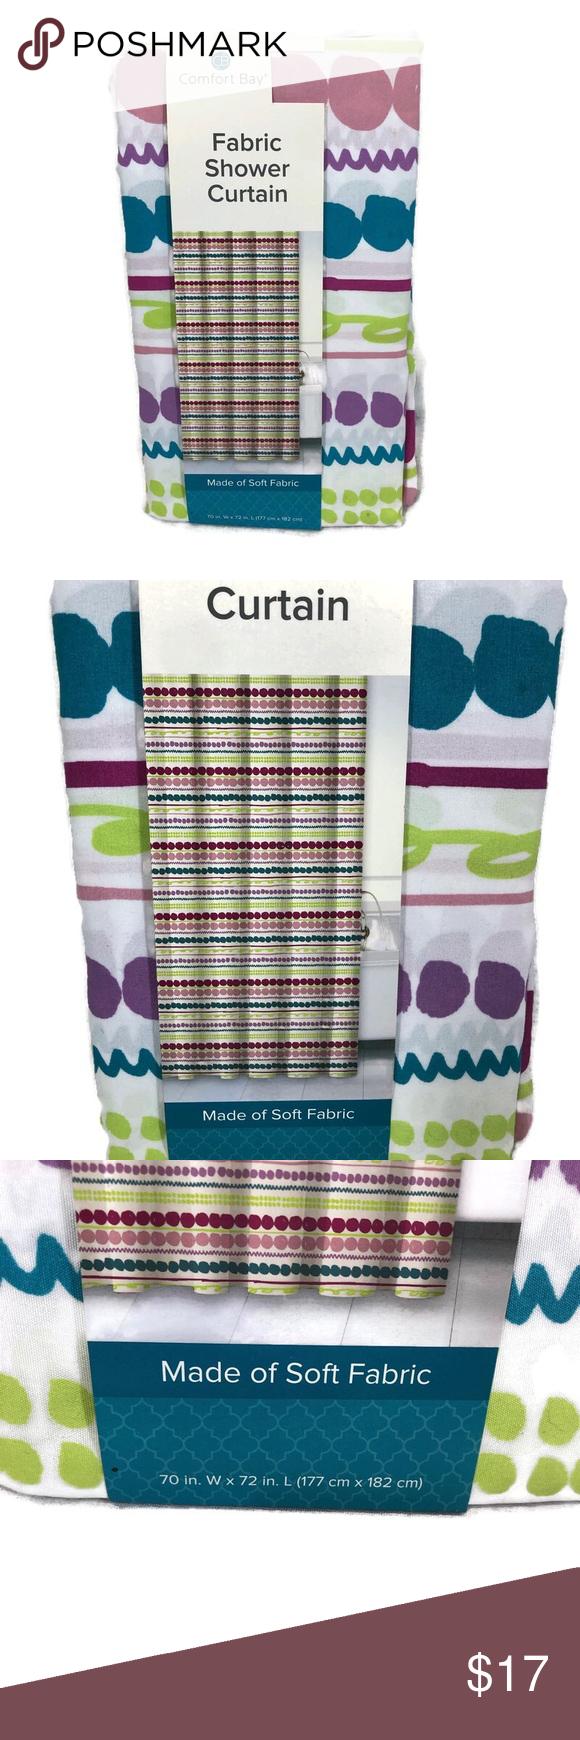 Brand New Comfort Bay Soft Fabric Shower Curtain Nwt Soft